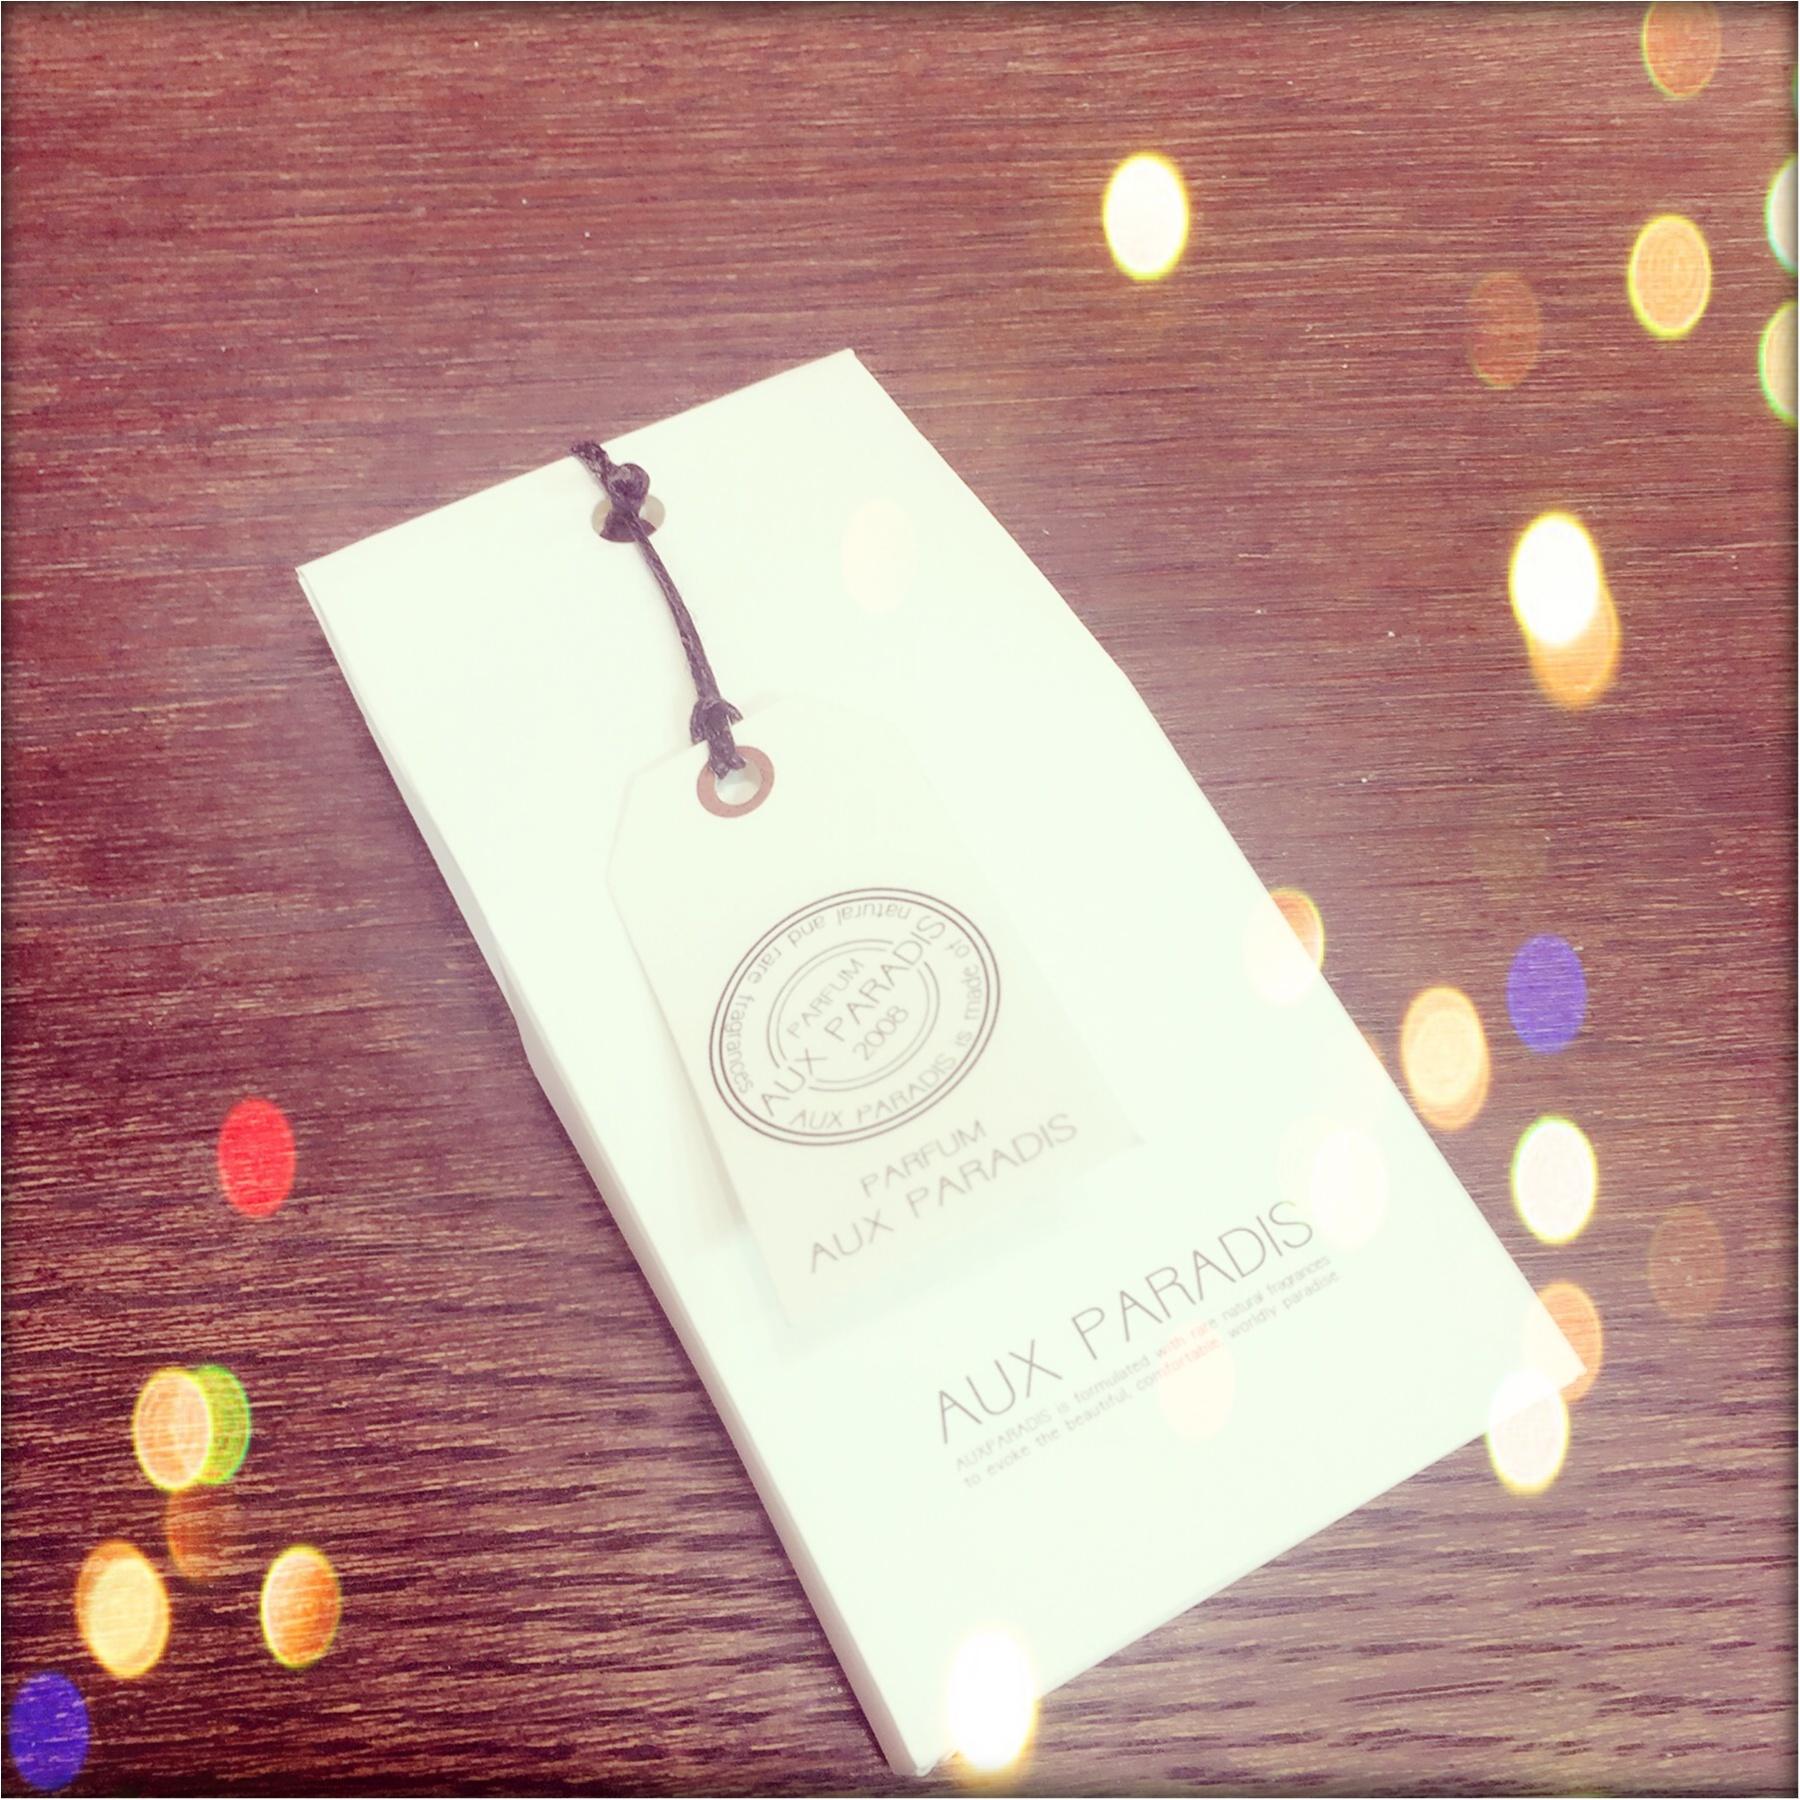 "…ஐ 【天然香料フレグランス】オゥパラディの""金木犀""の香り♥️オーガニックな香りをこの冬にふんわり取り入れよう◟́◞̀❤︎_2"